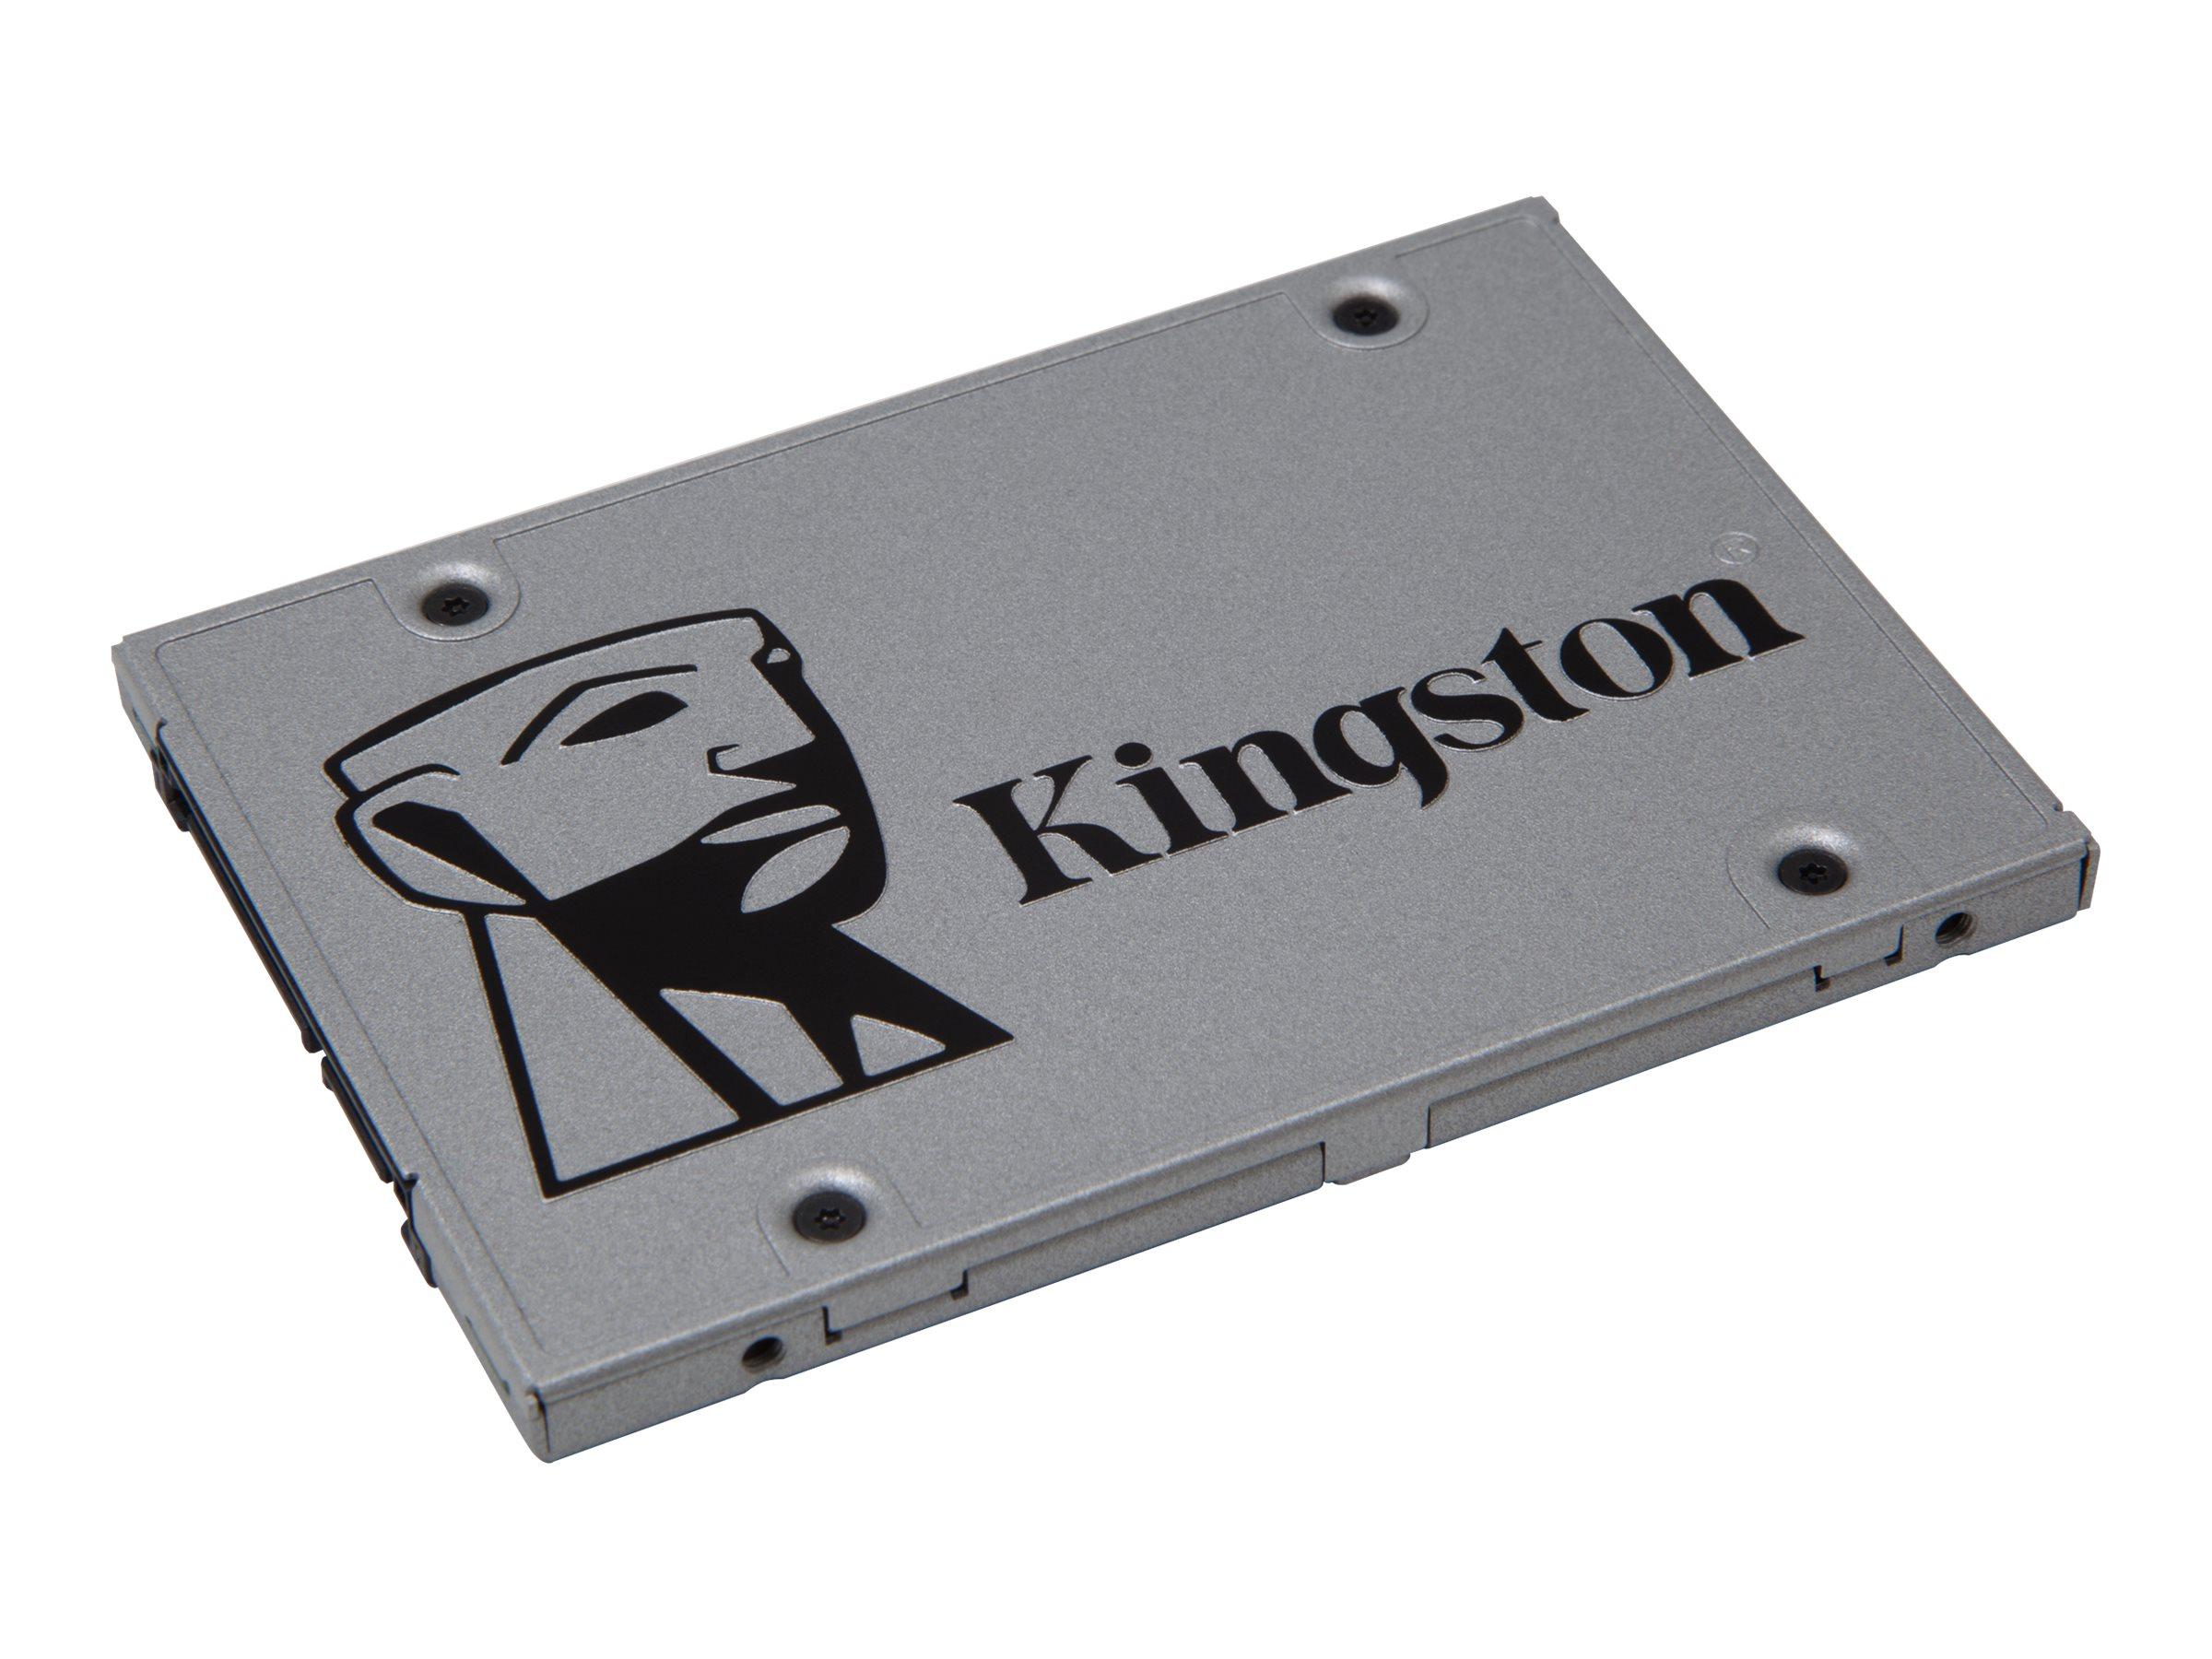 Kingston 480GB UV400 C2C Solid State Drive